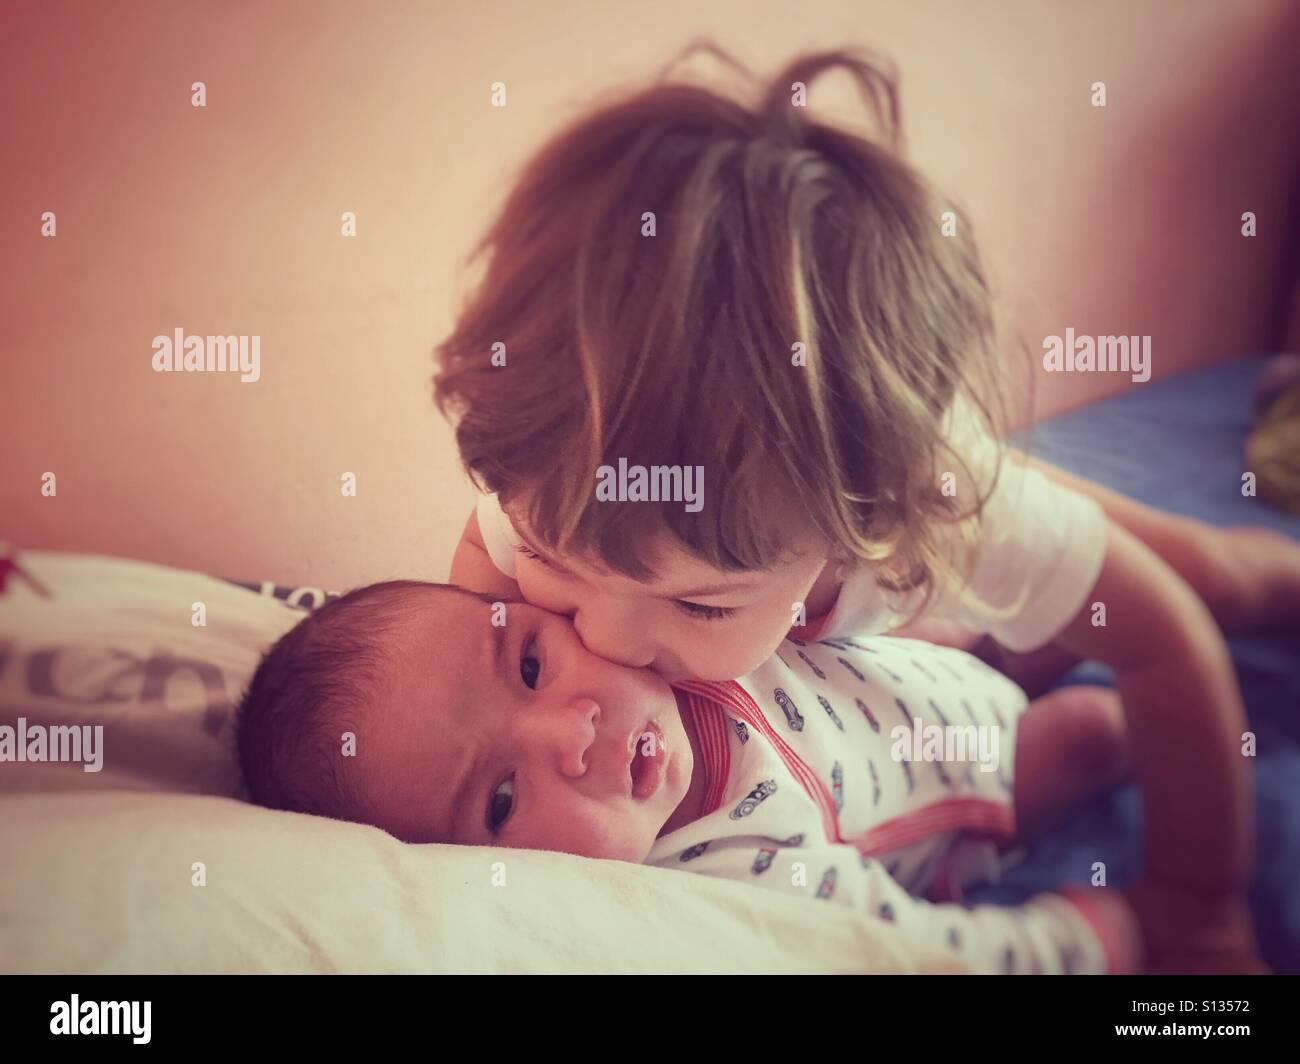 Besando a su hermana hermano Foto de stock